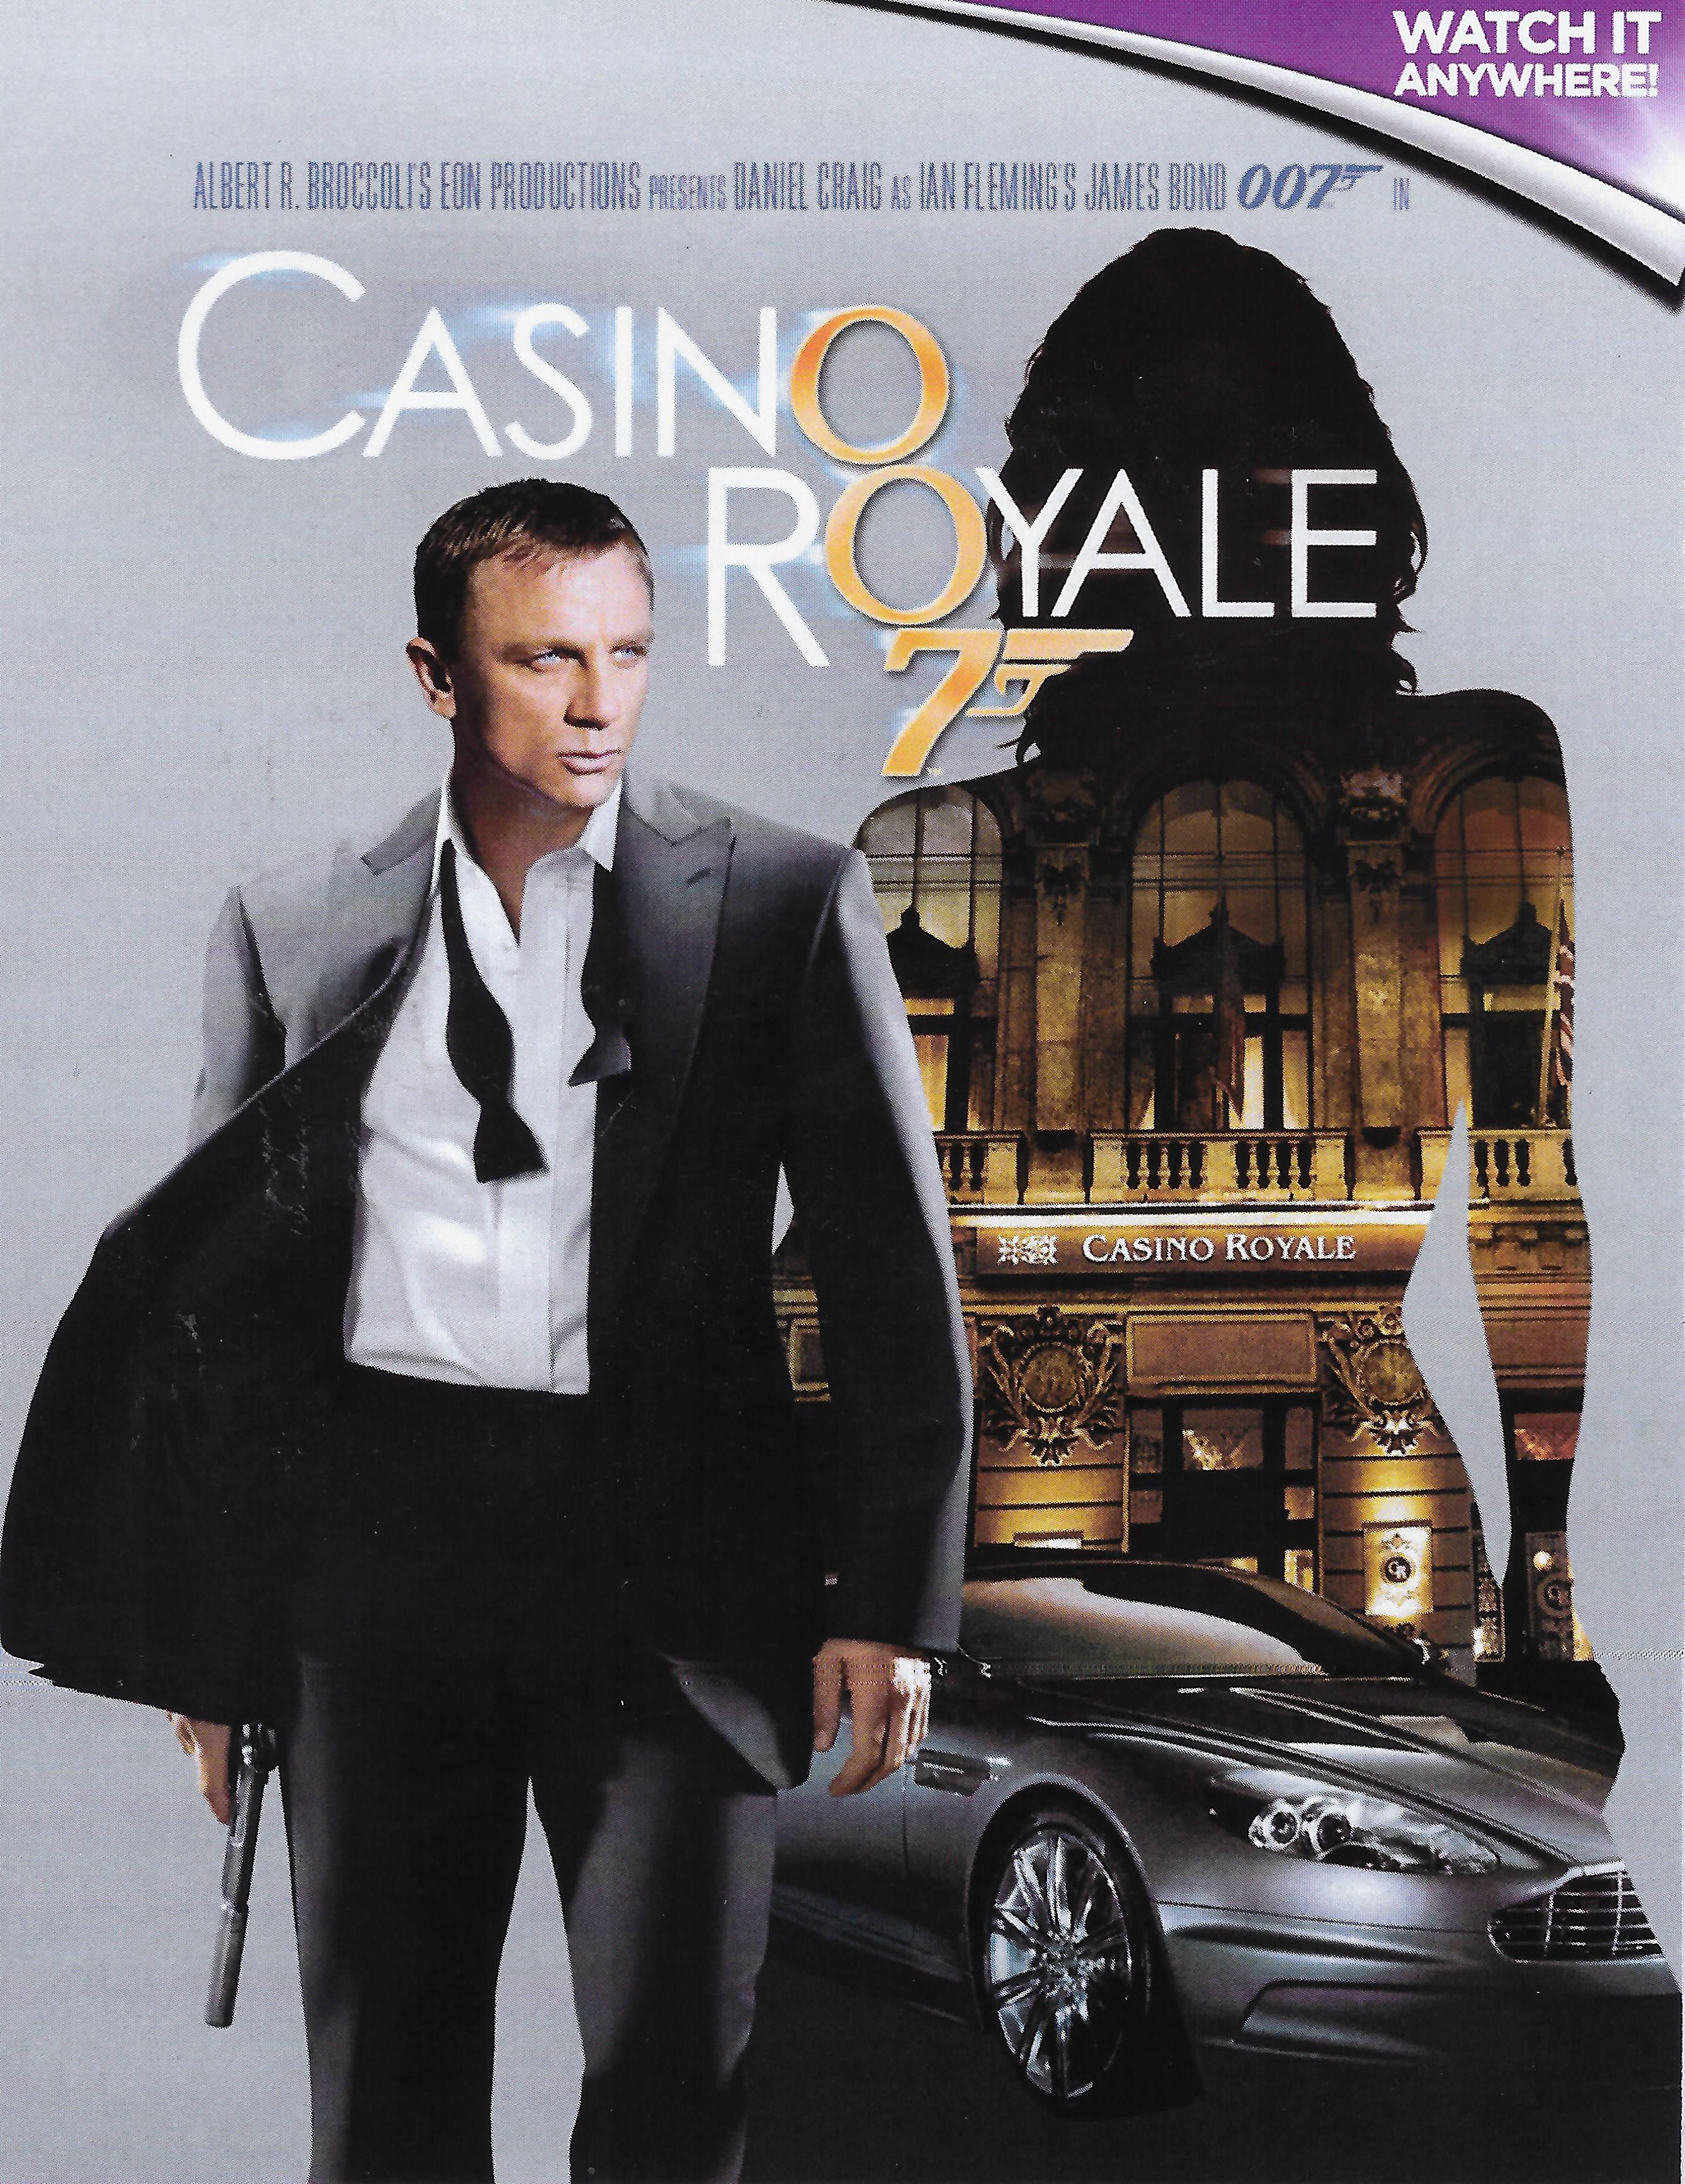 Casino ebert review roger royale james bond casino royale poker set